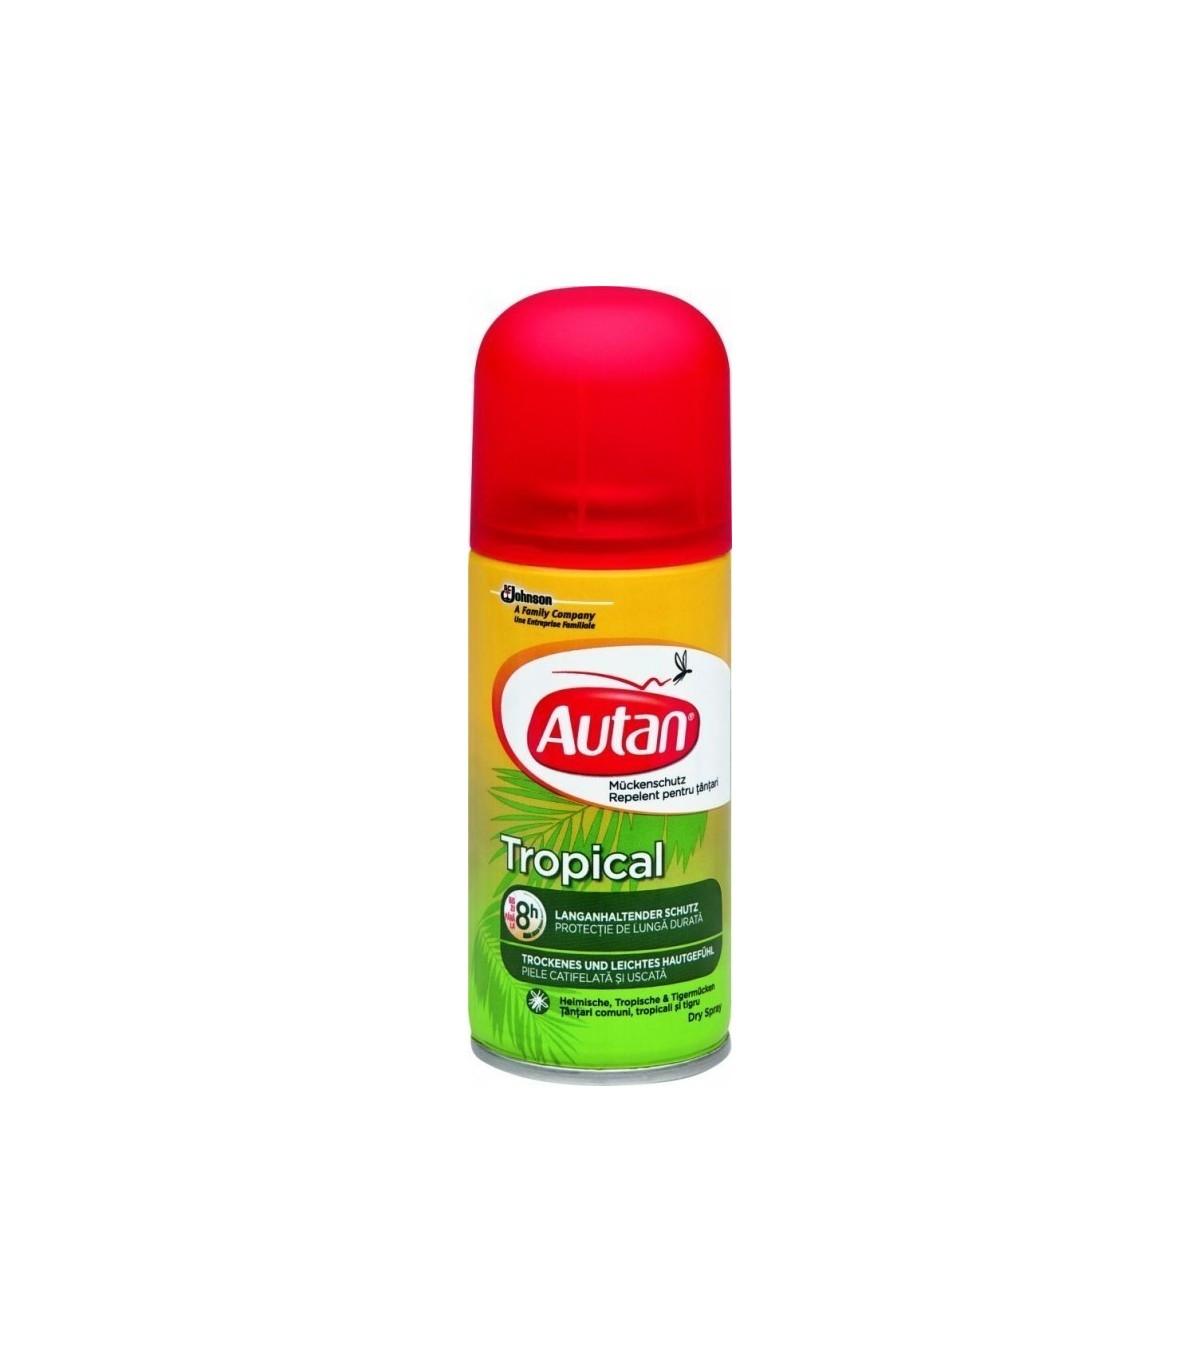 АУТАН Тропикал сух спрей 100мл | AUTAN Tropical dry spray 100ml